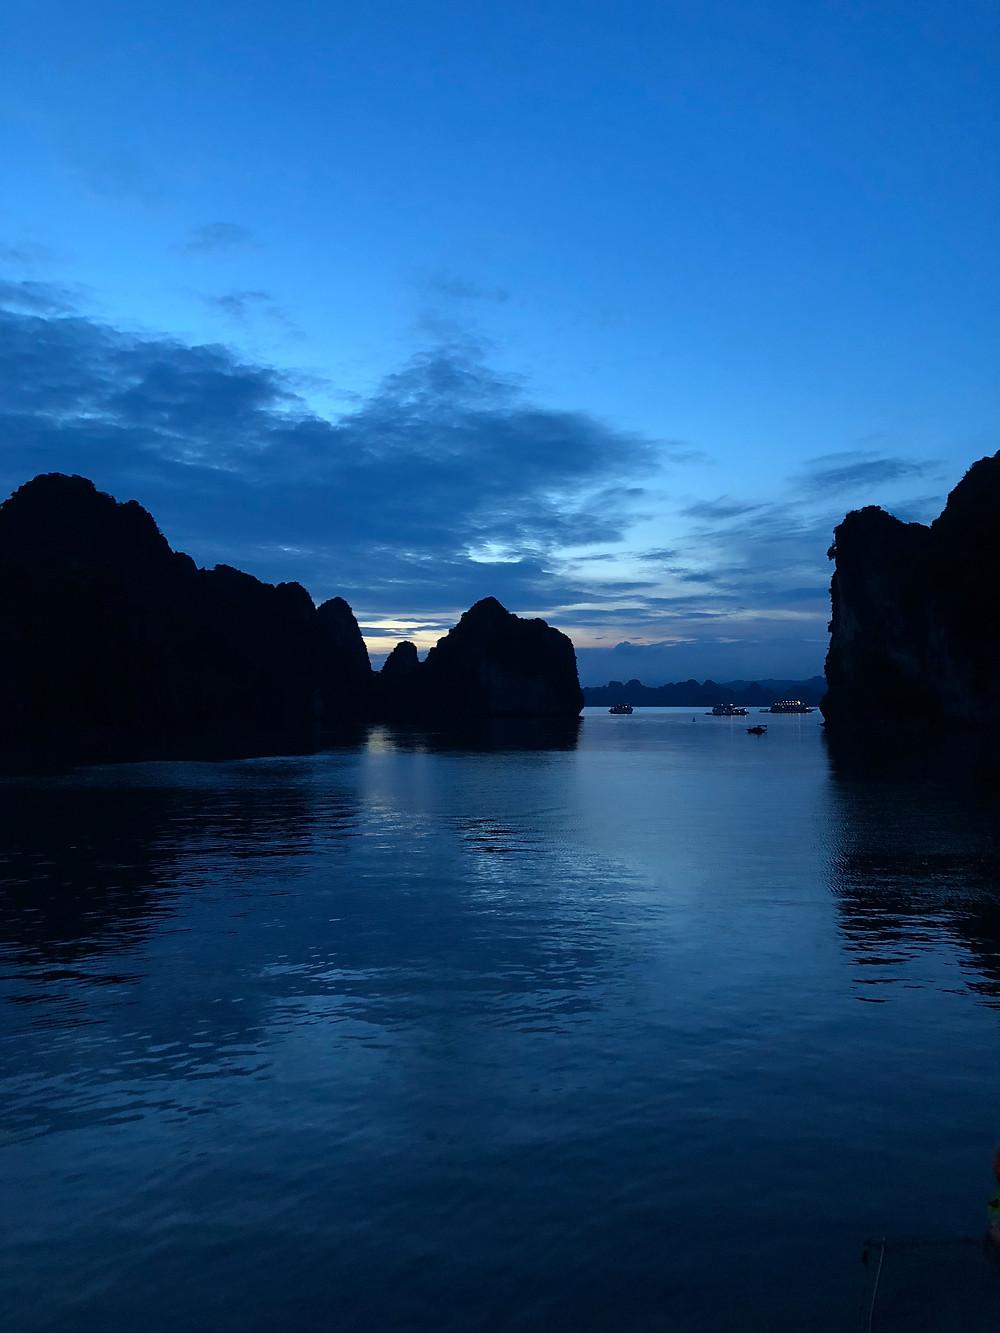 Sunset in Halong Bay Vietnam